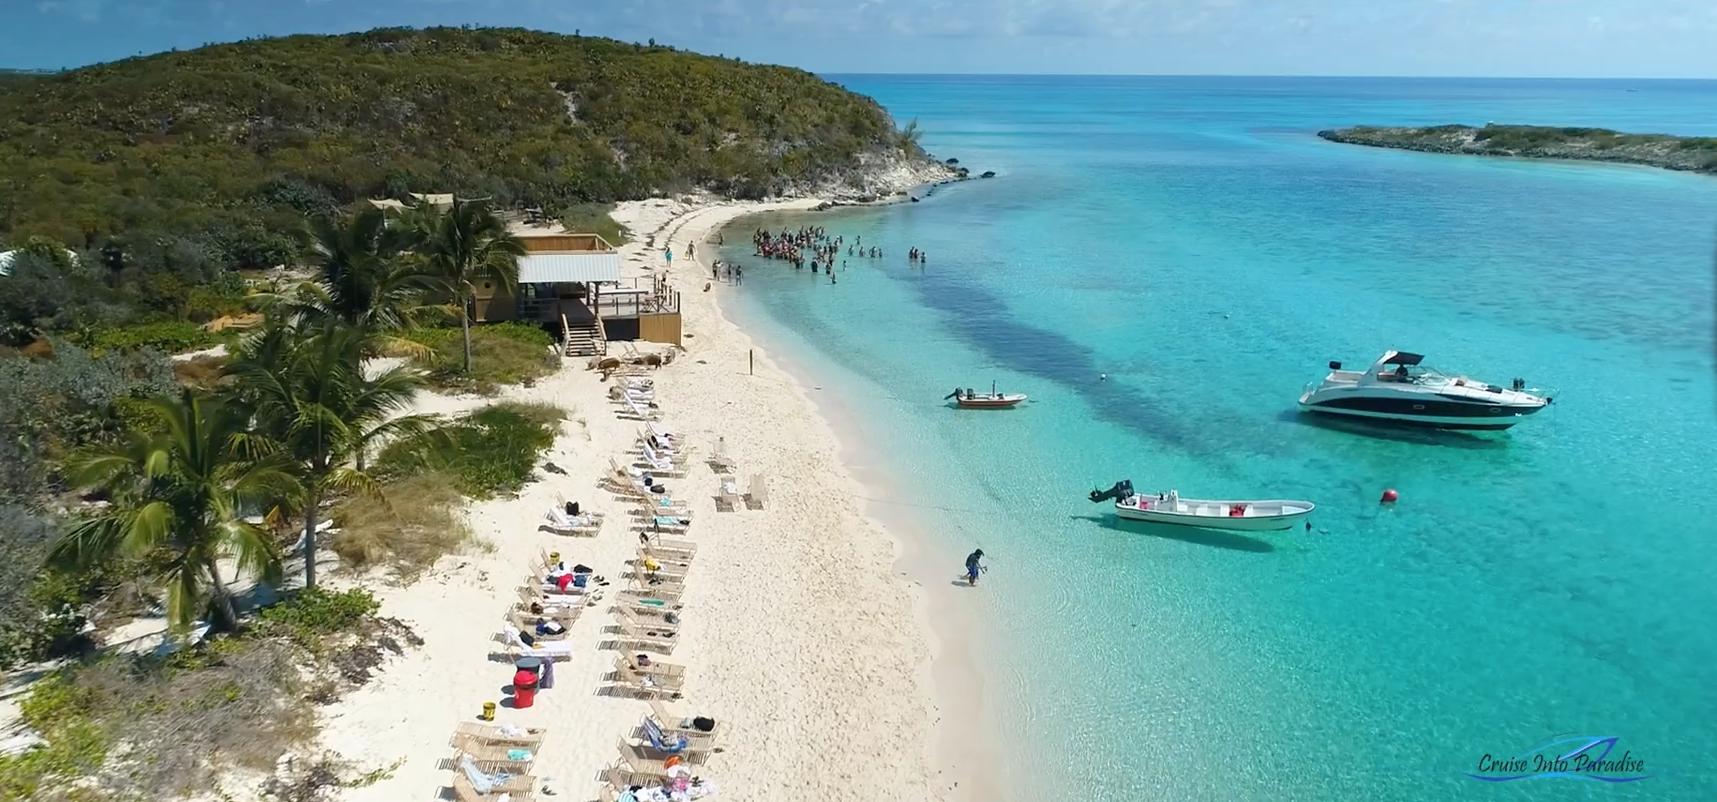 The Exumas | Cruise Into Paradise | Boat Rental In Bahamas